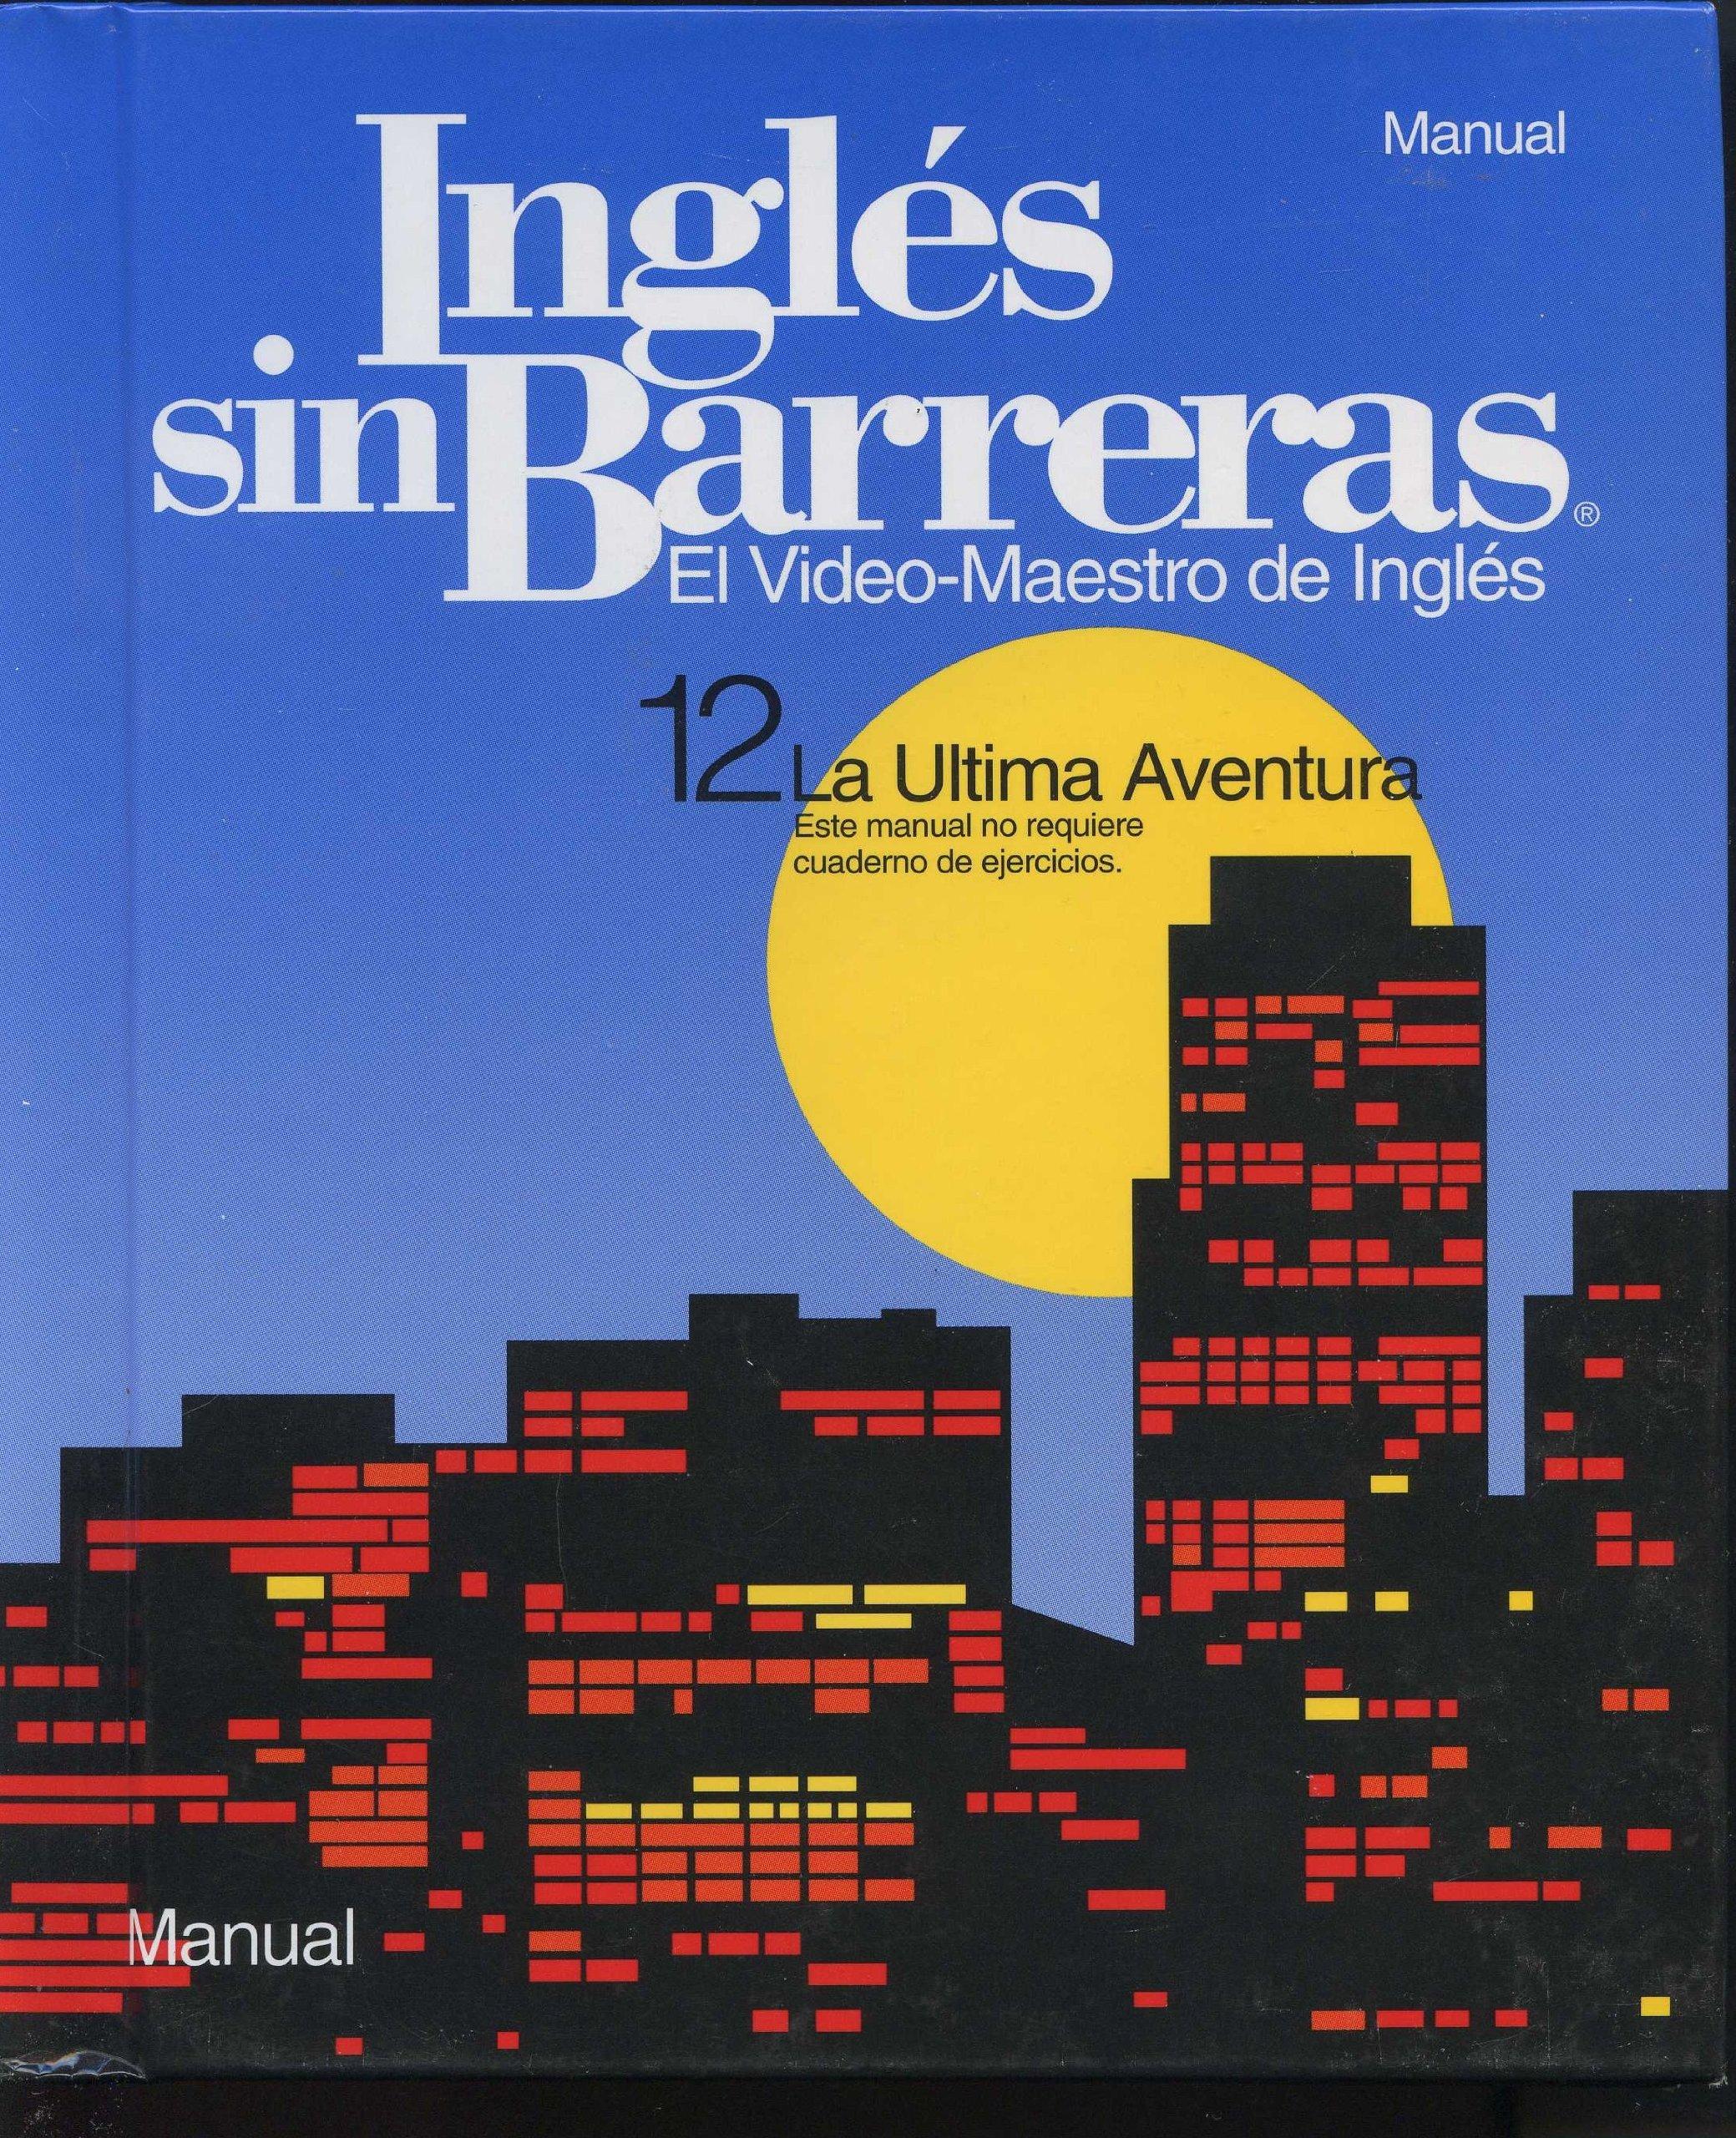 ingles sin barreras manual el de ingles la ultima aventura various maria vidal amazoncom books